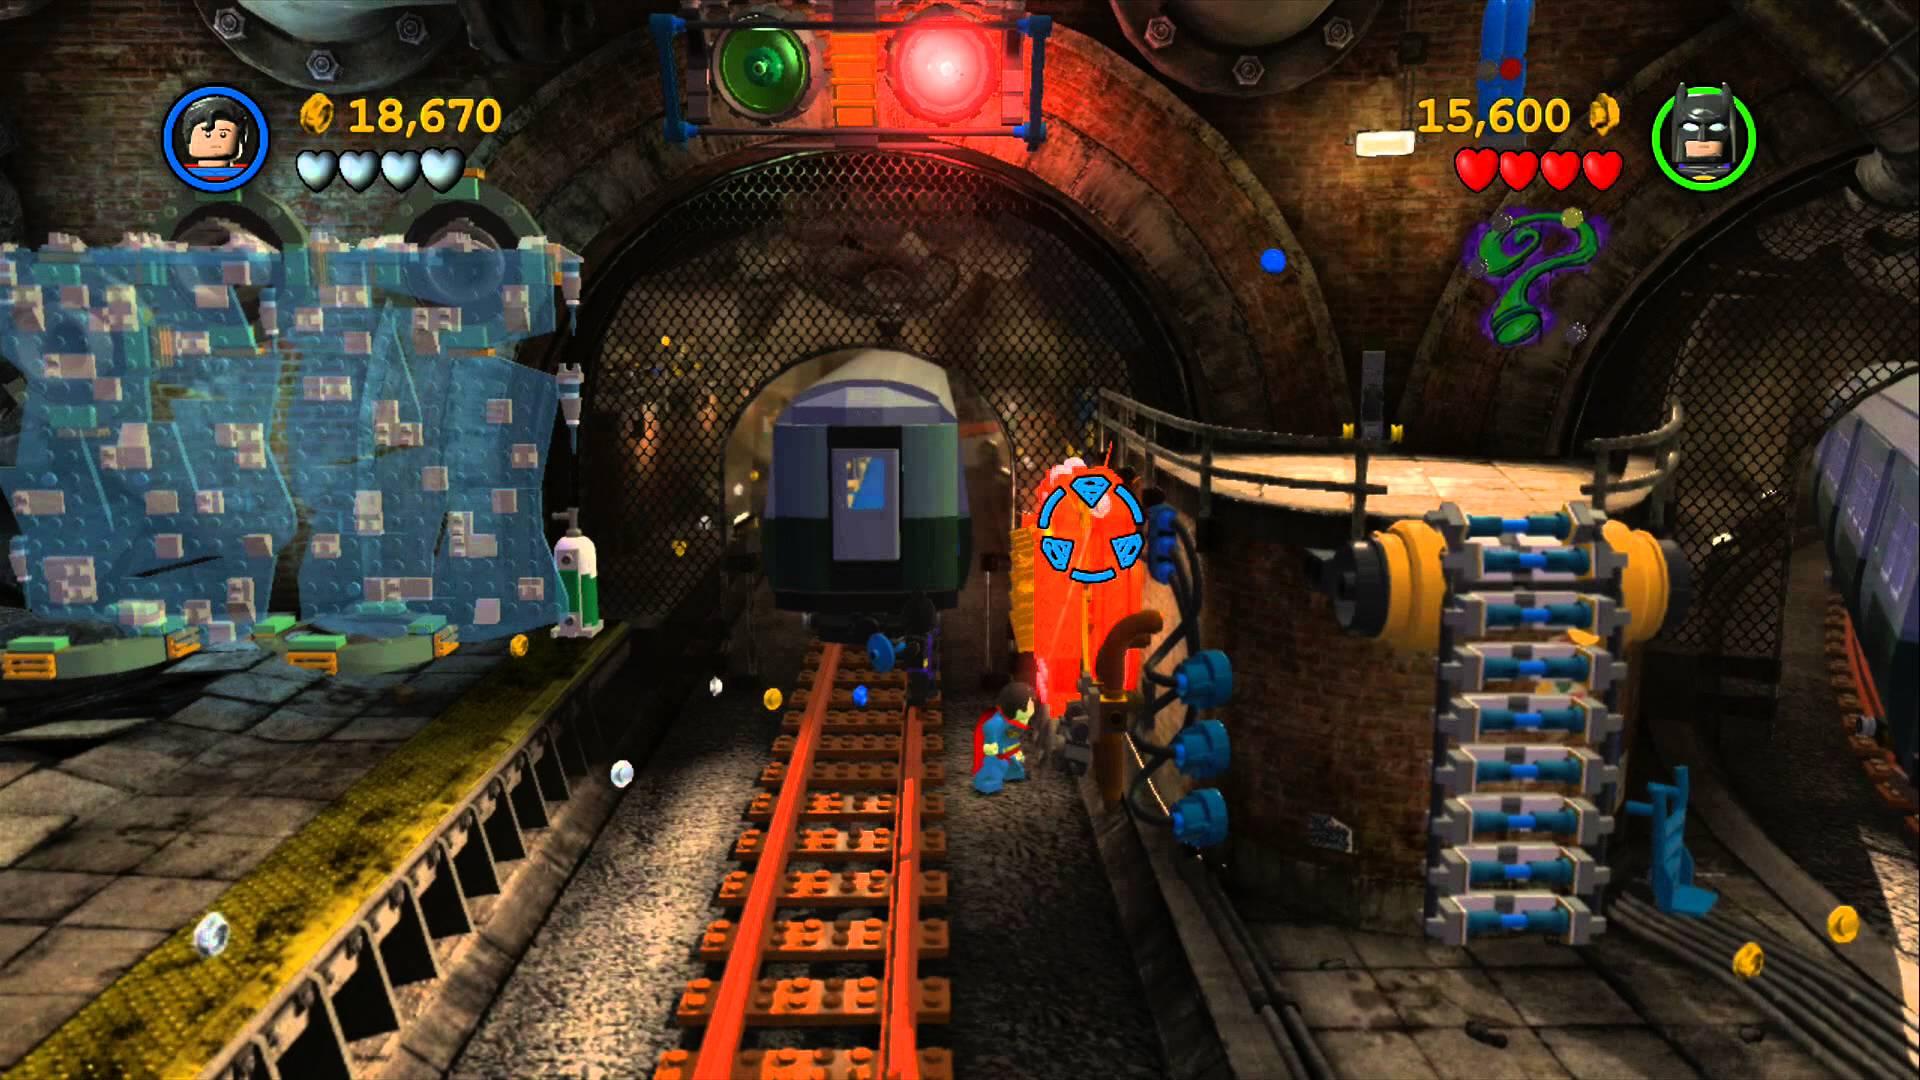 Nice Images Collection: LEGO Batman 2: DC Super Heroes Desktop Wallpapers